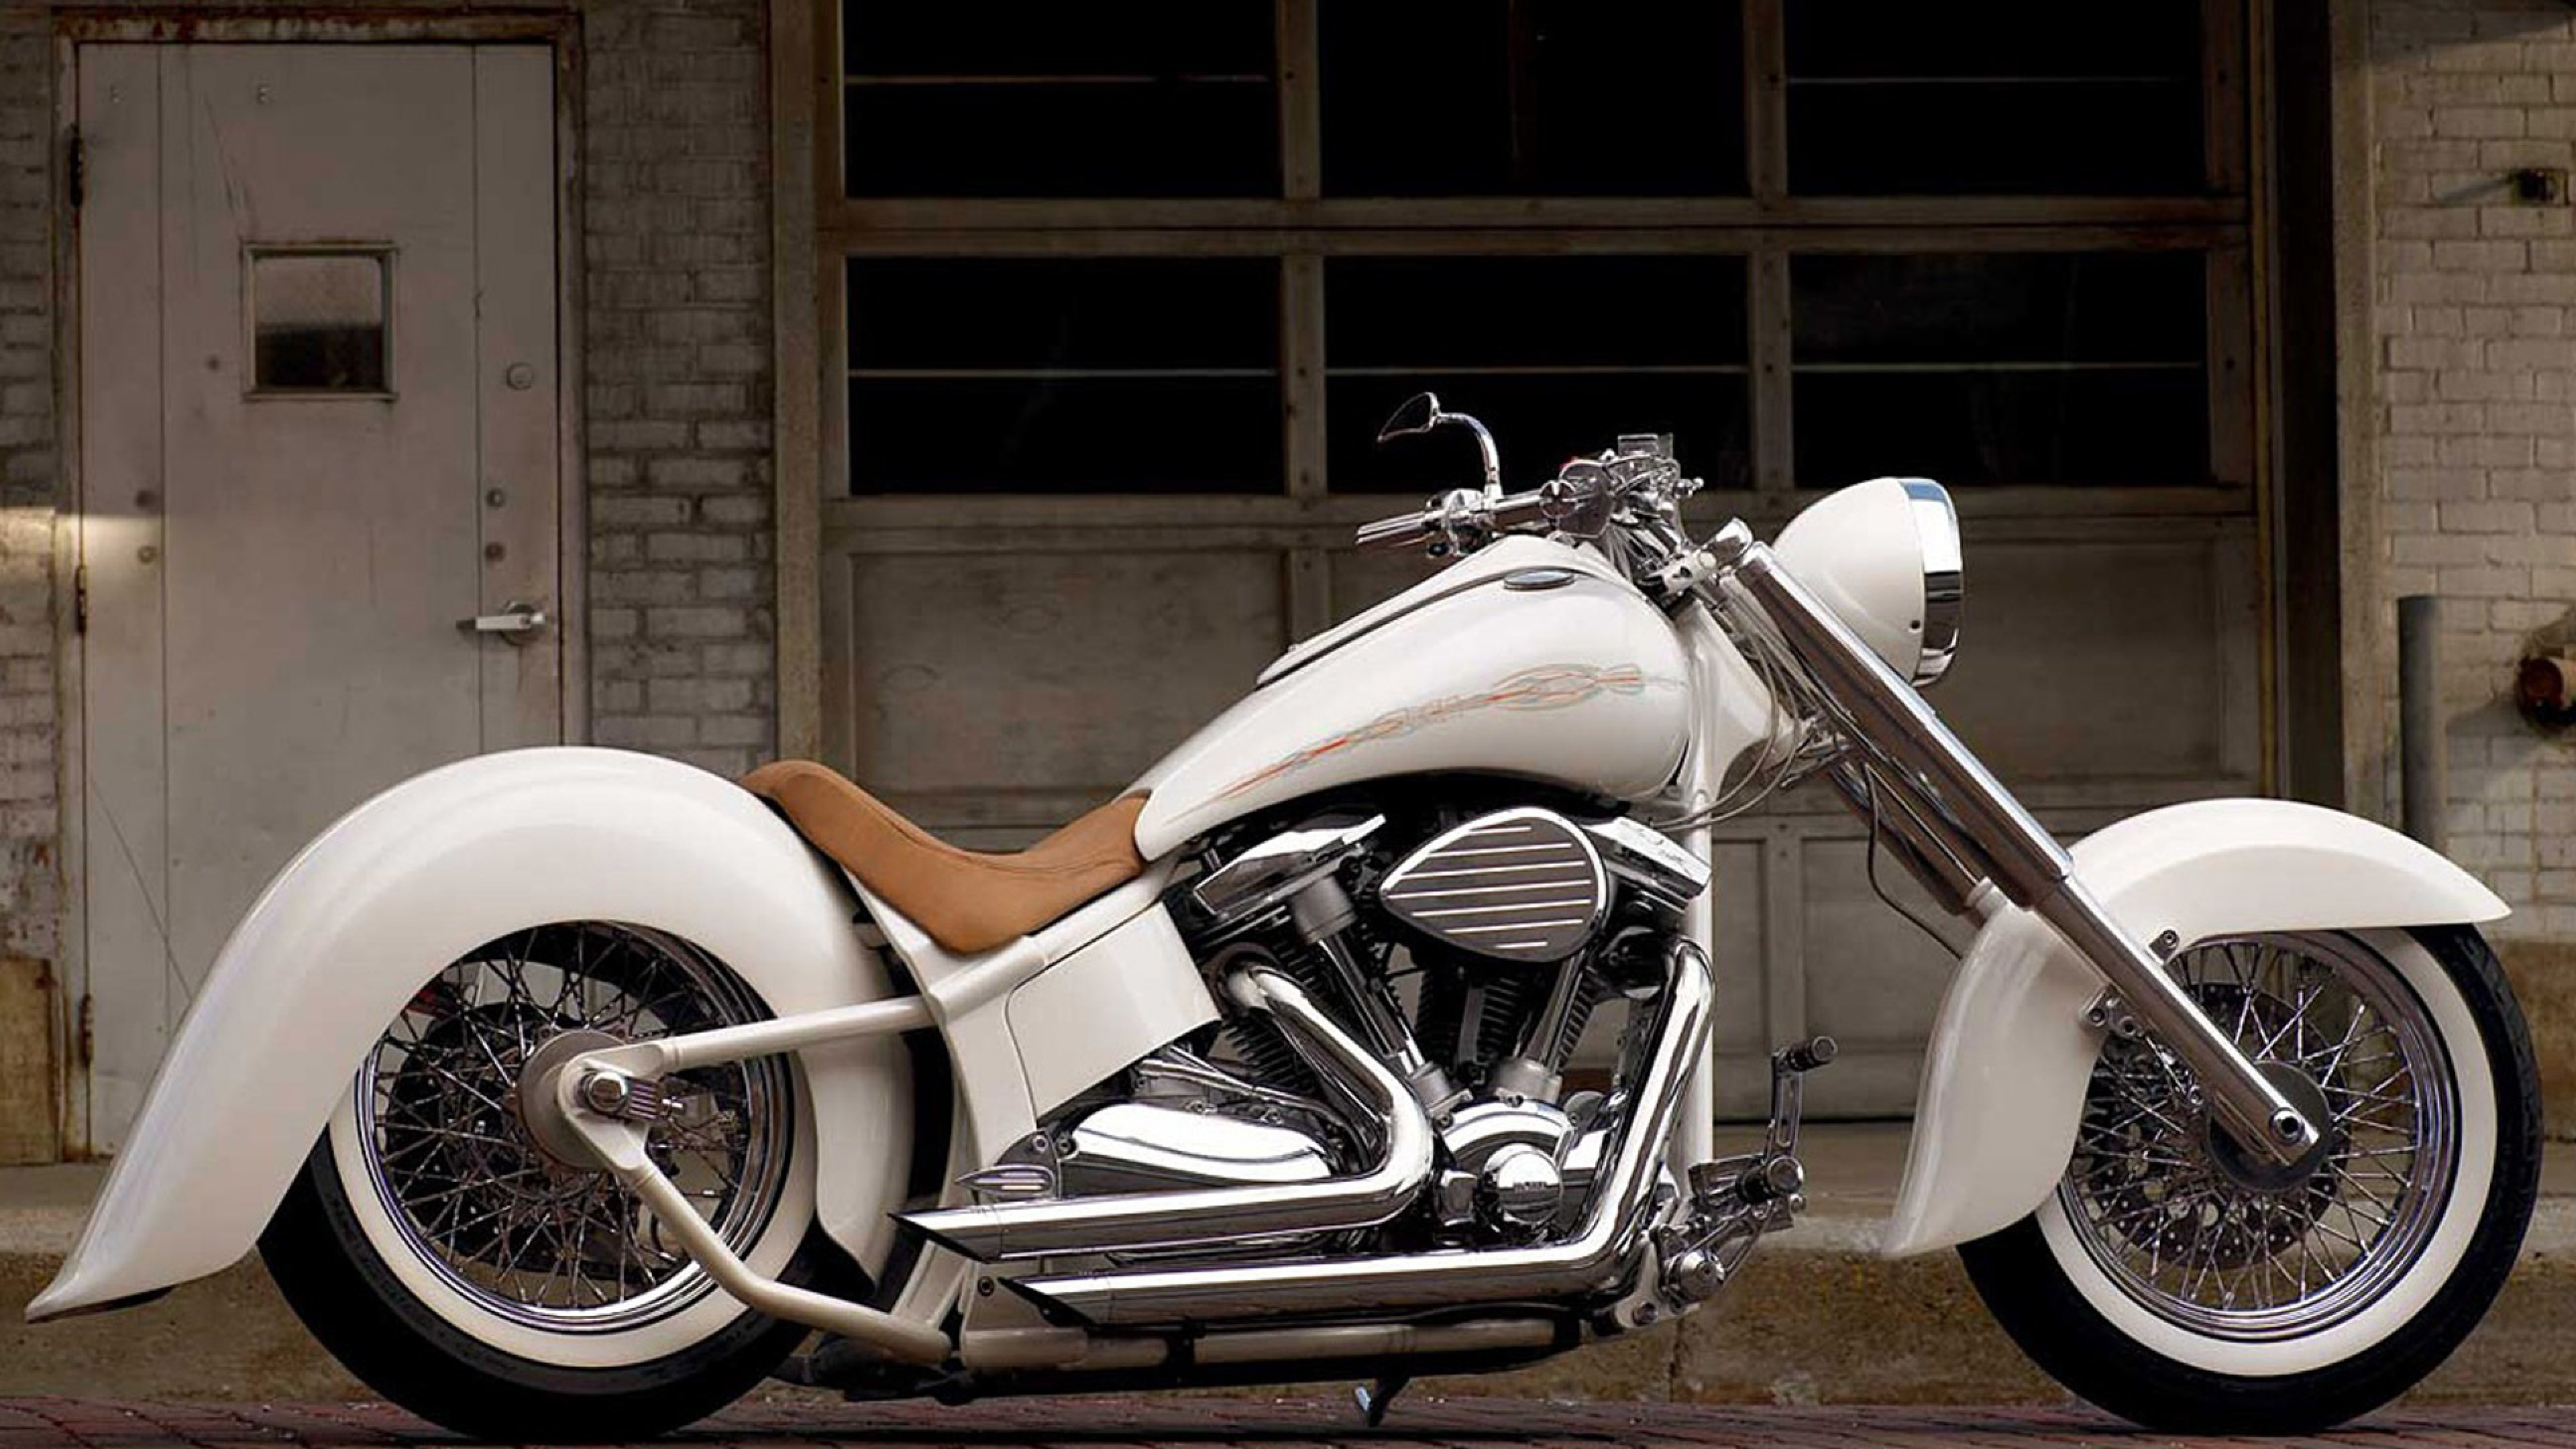 Yamaha Star Motorcycle, HD Bikes, 4k Wallpapers, Images